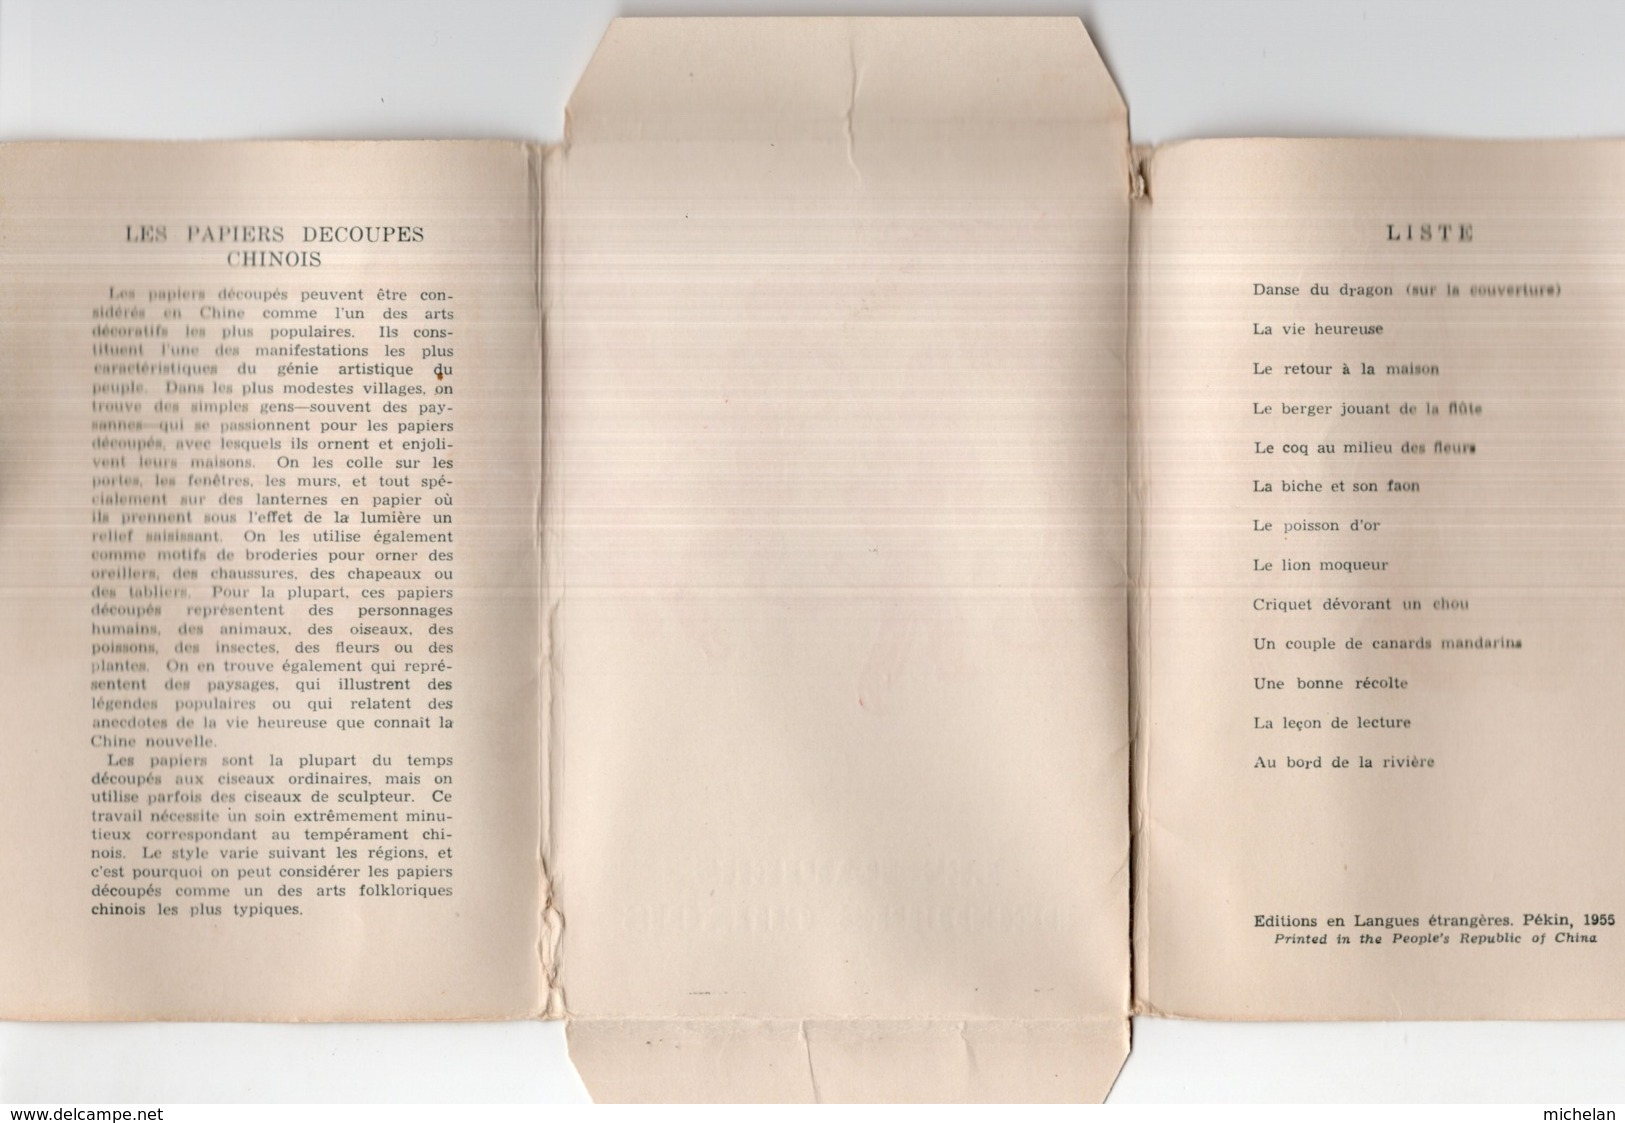 12 CPA SOUS POCHETTE ?   CHINE---LES PAPIERS DECOUPES CHINOIS---FORMAT CPA 98 * 152mm--pochette 104 * 154mm---1955 - Cina